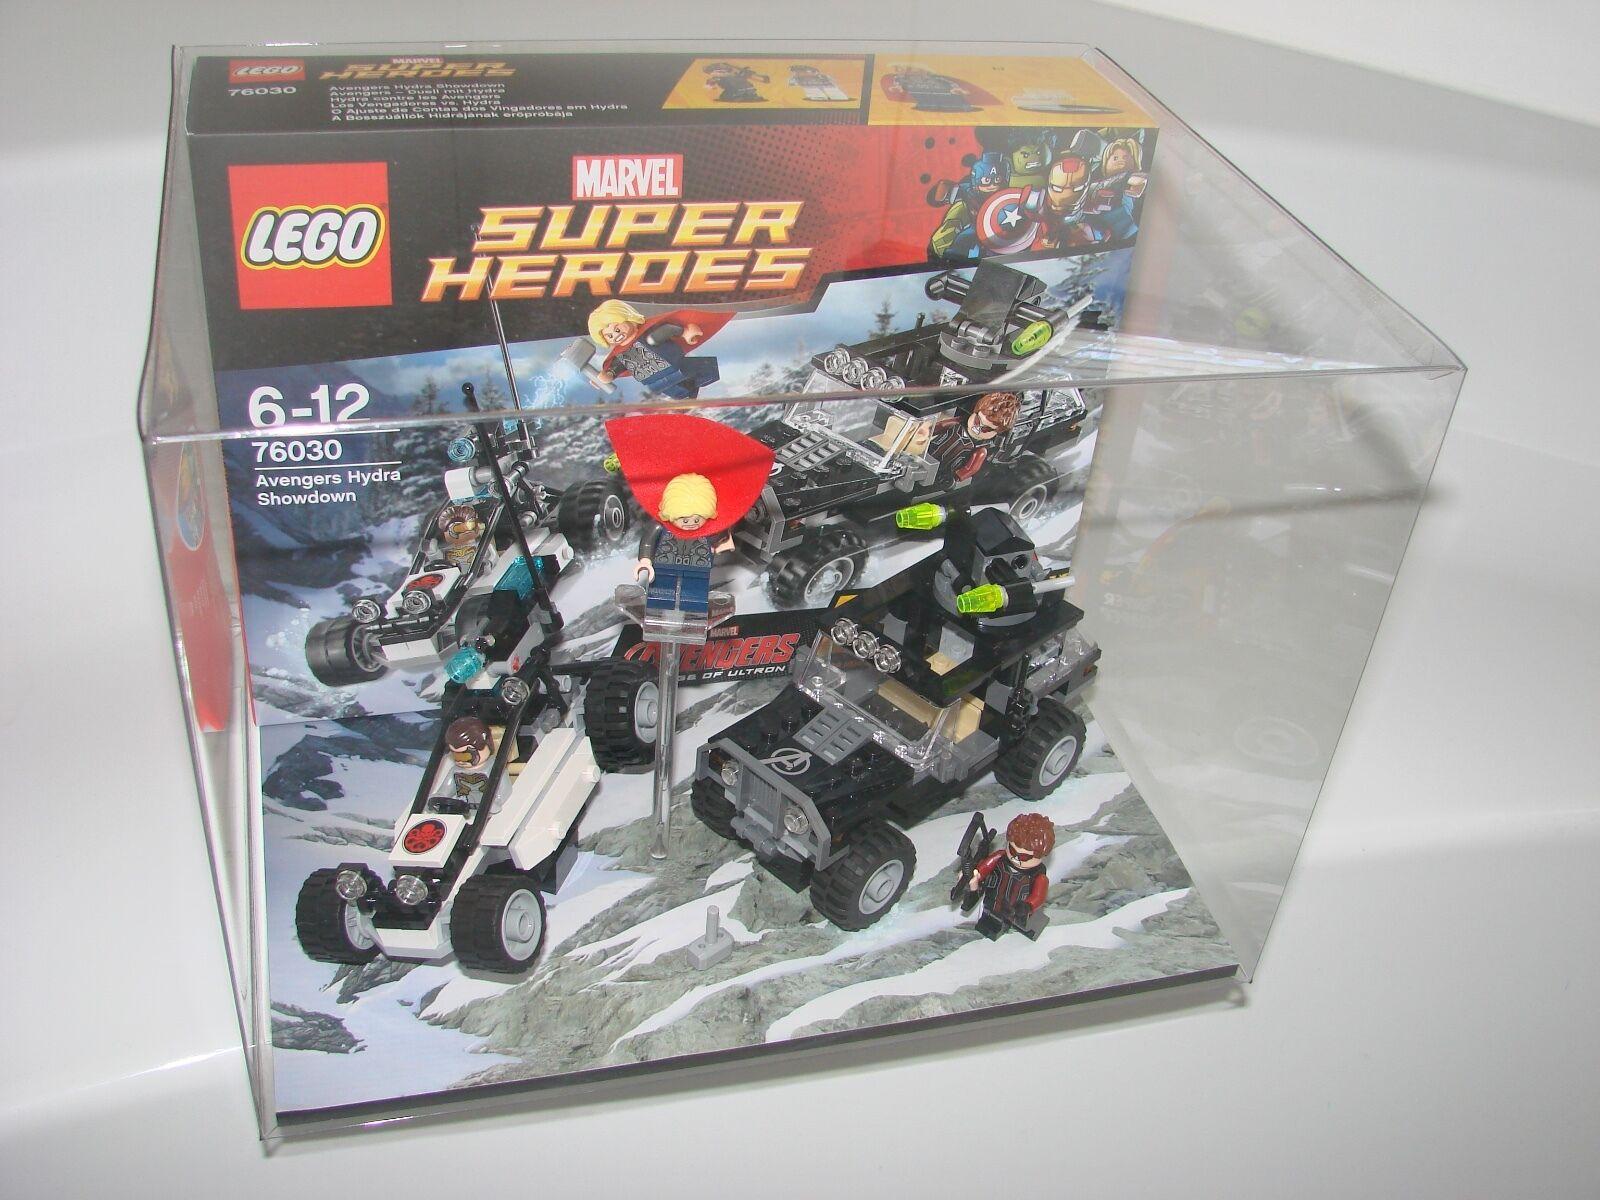 LEGO® DC Comics Super Heroes Heroes Heroes 76030 DIORAMA -Schaukasten Avengers Hydra Showdown 881d6c